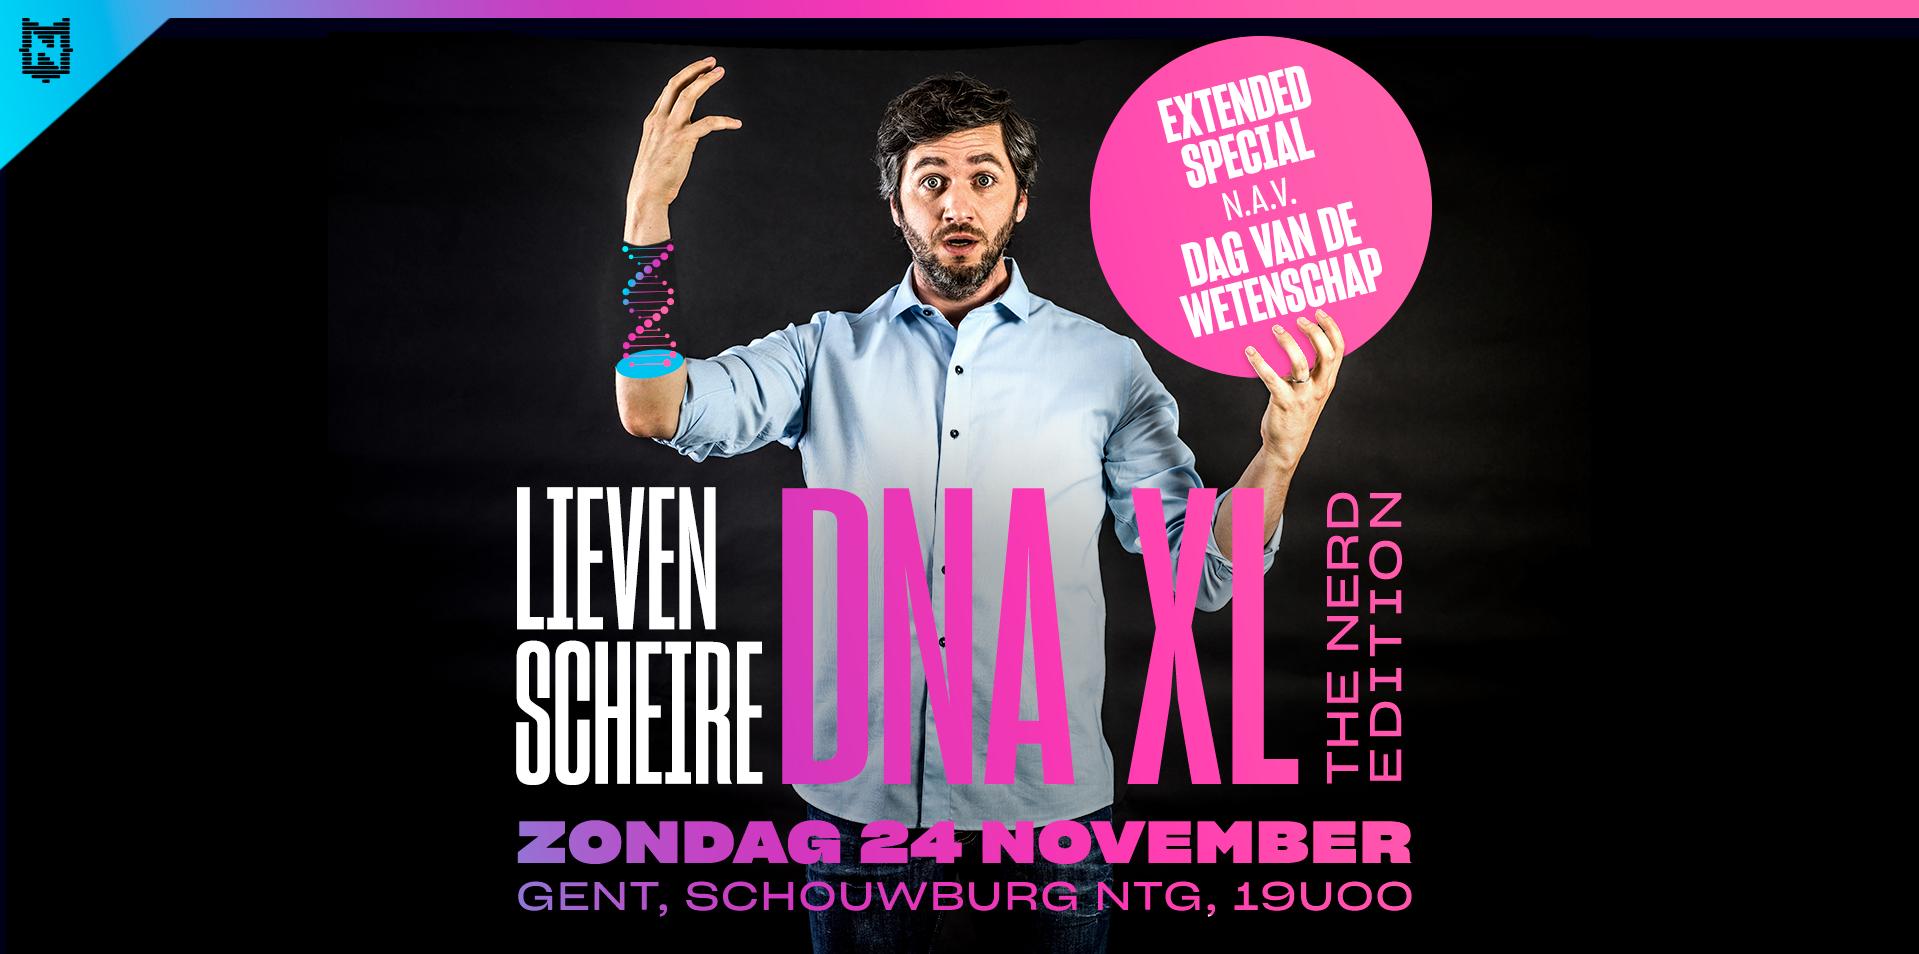 Lieven_DNAXL_header.png